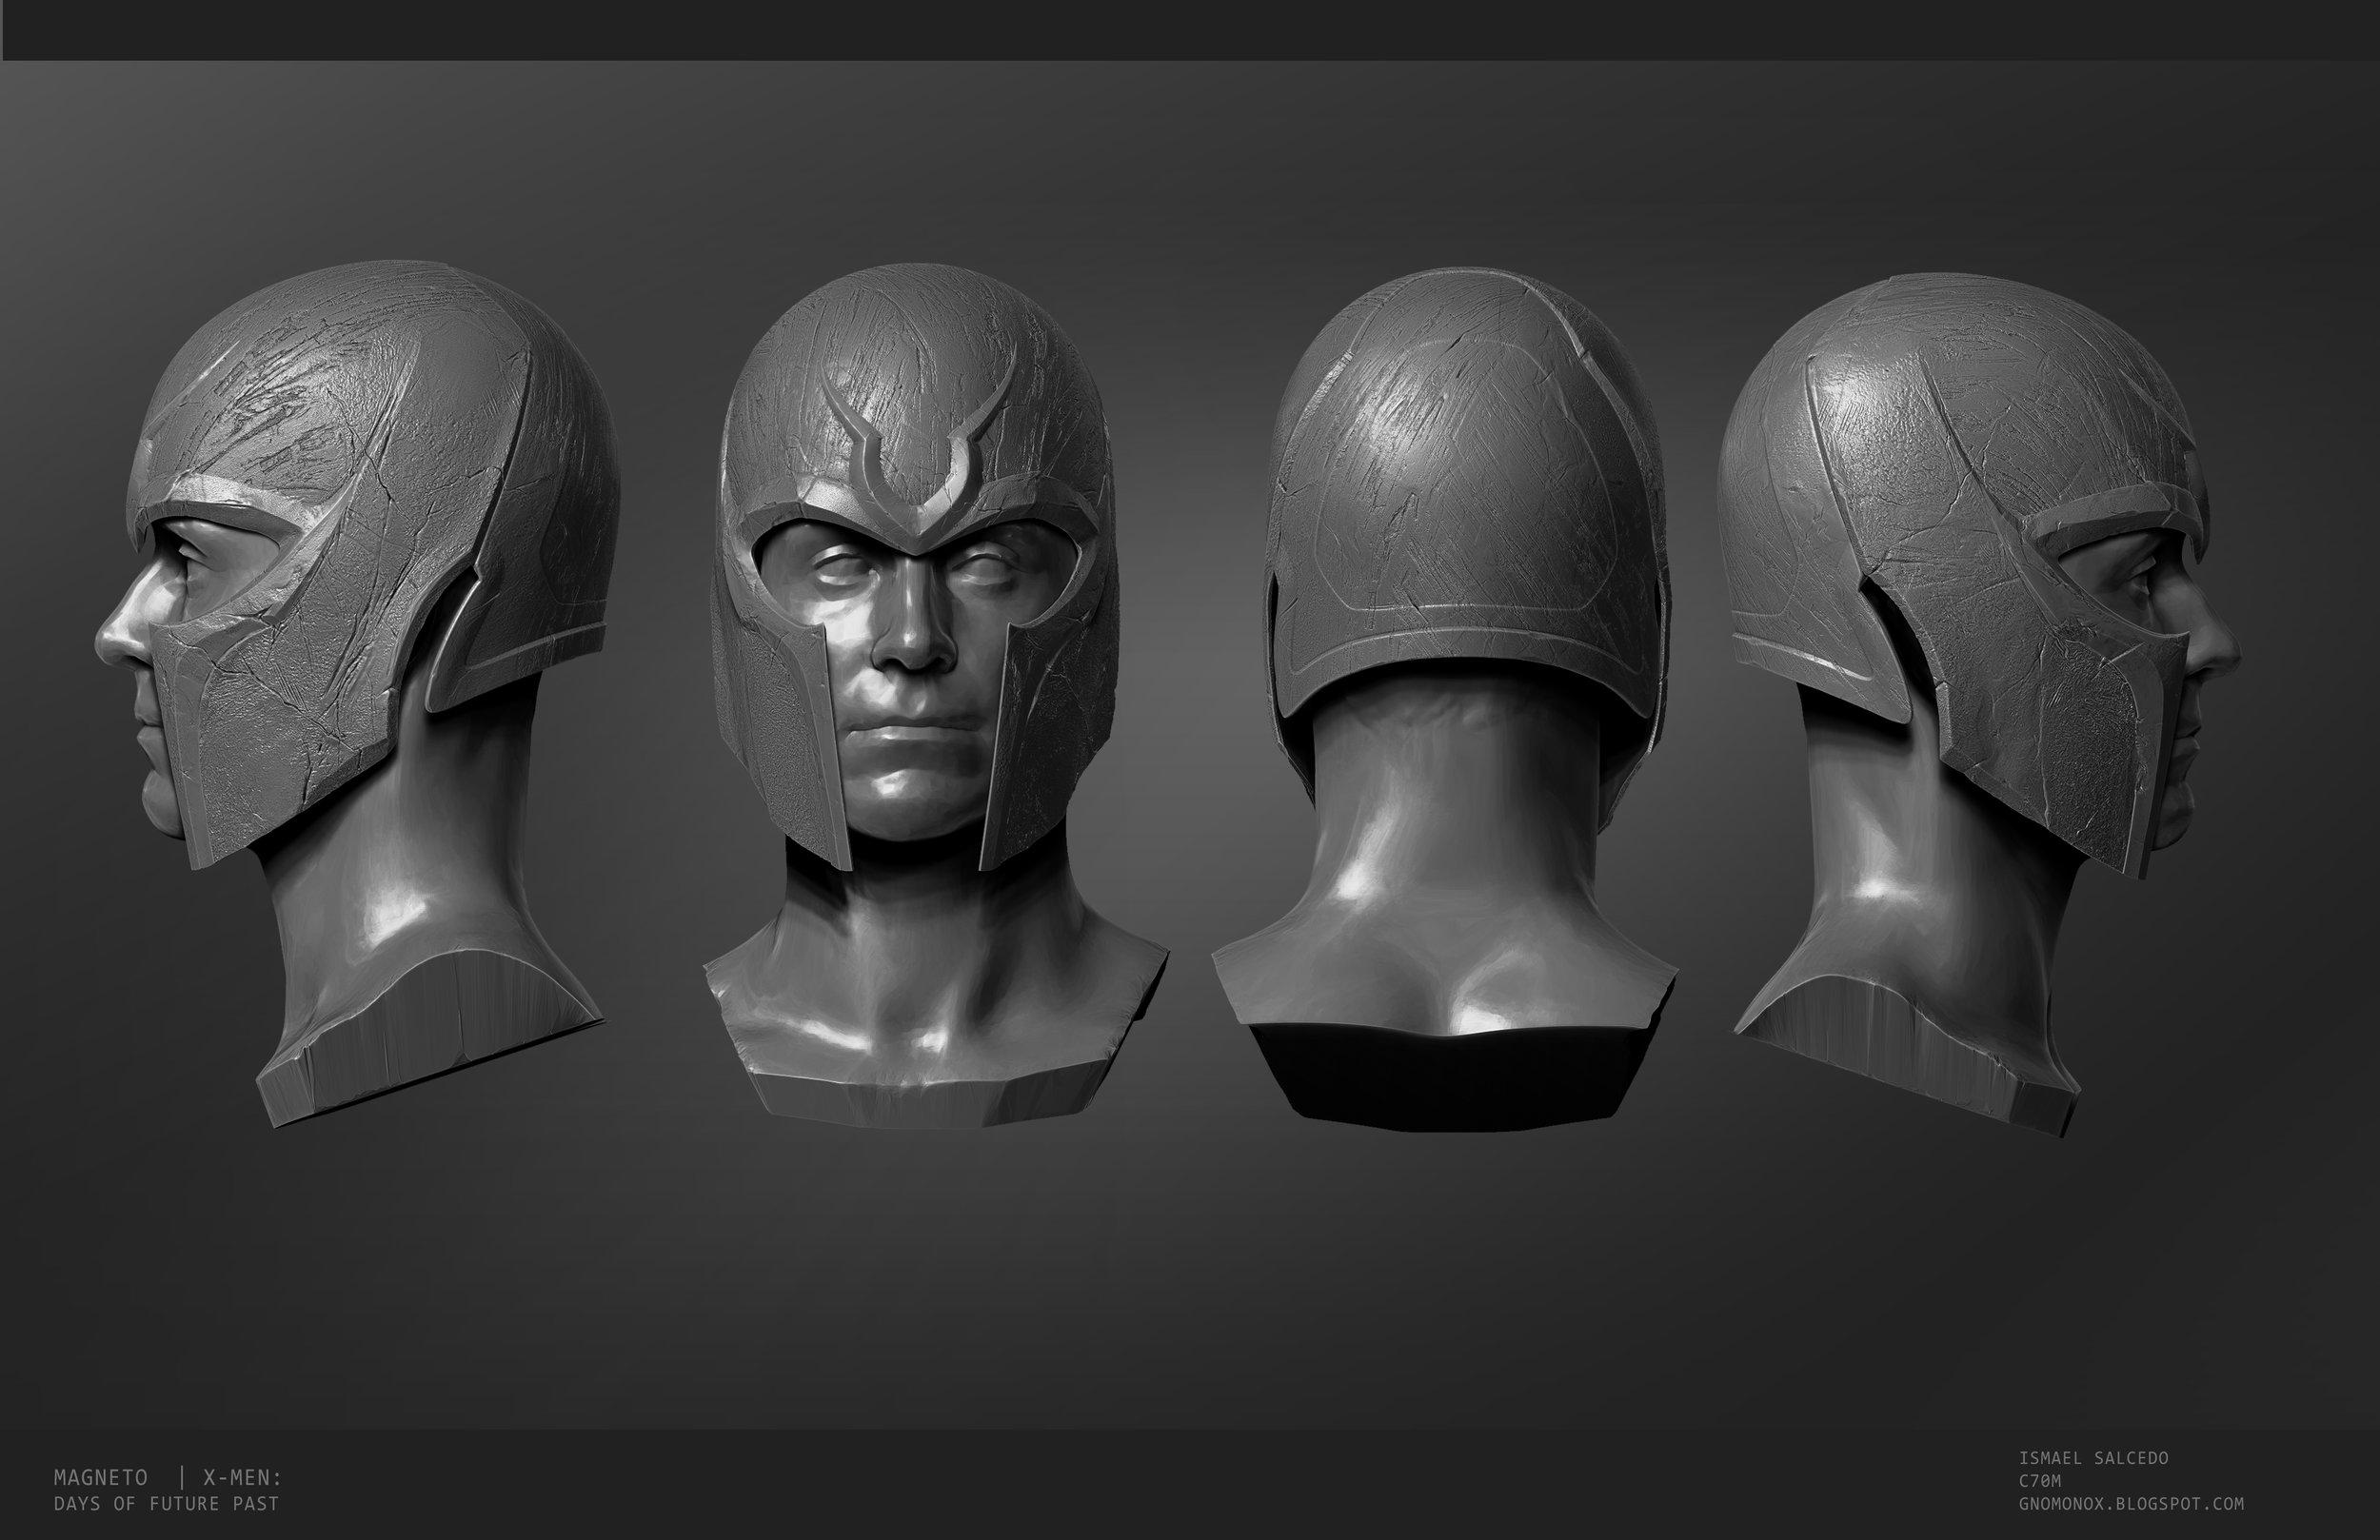 Ismael_C70M_Magneto_Sculpt.jpg